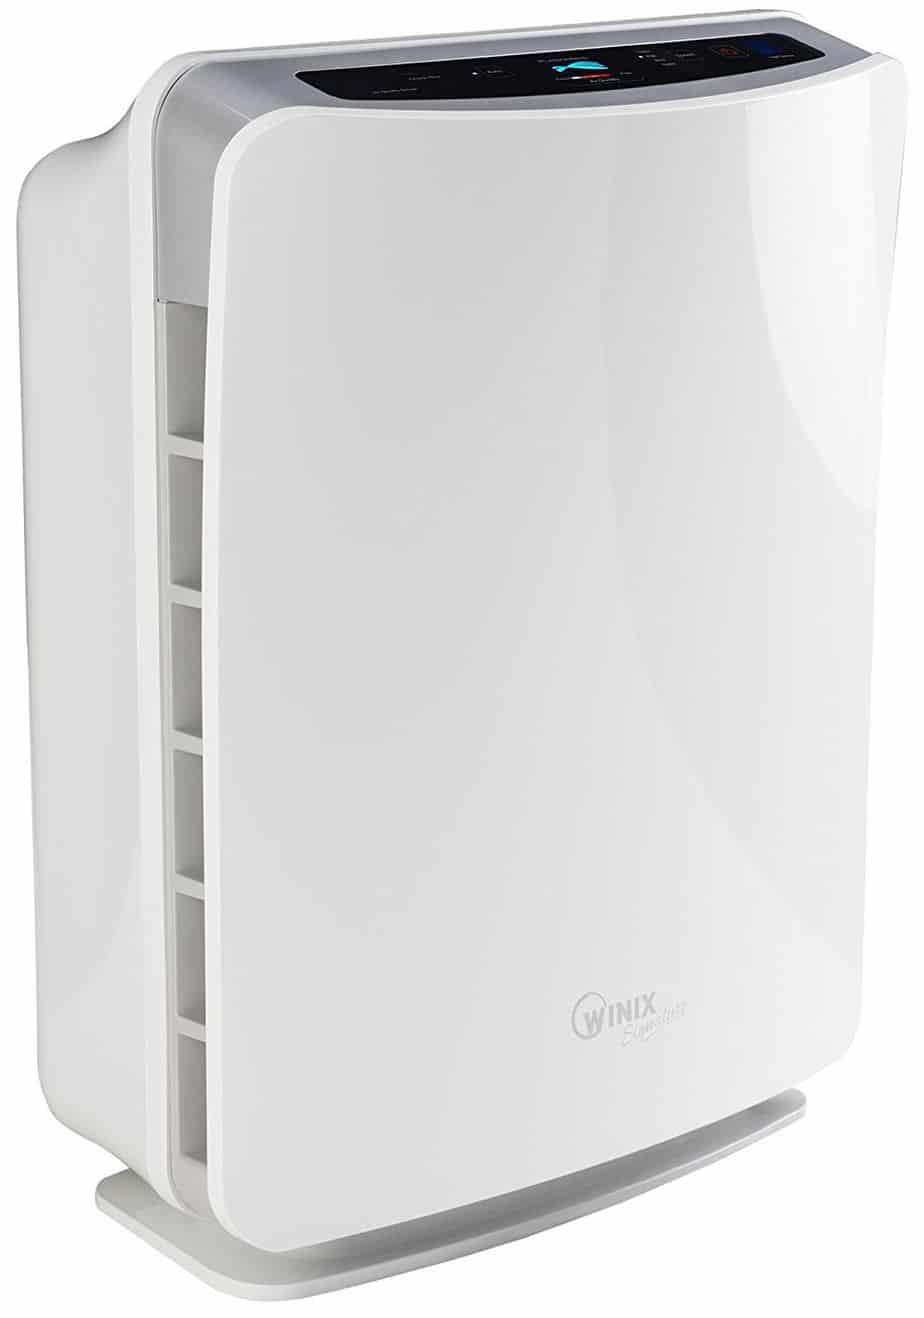 WINIX U300 True HEPA Air Purifier with AOC Washable Carbon Filter, 30 sqm, White